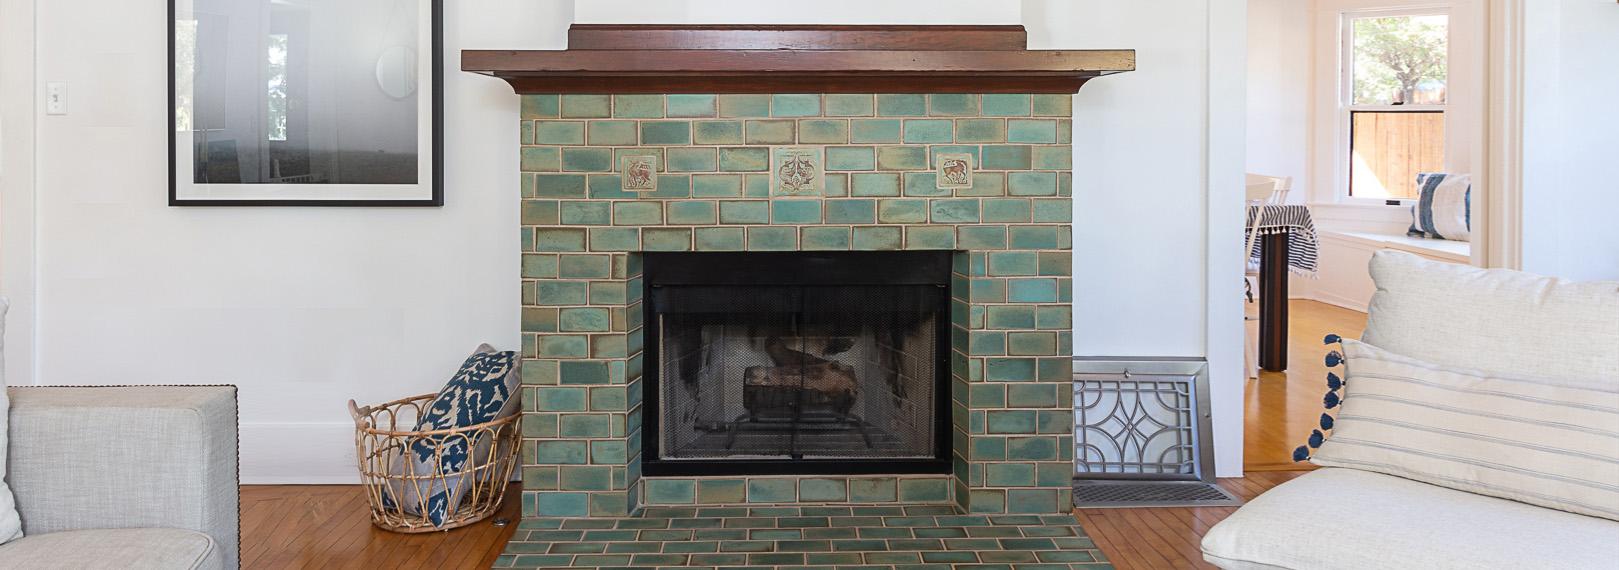 Meridian-fireplace